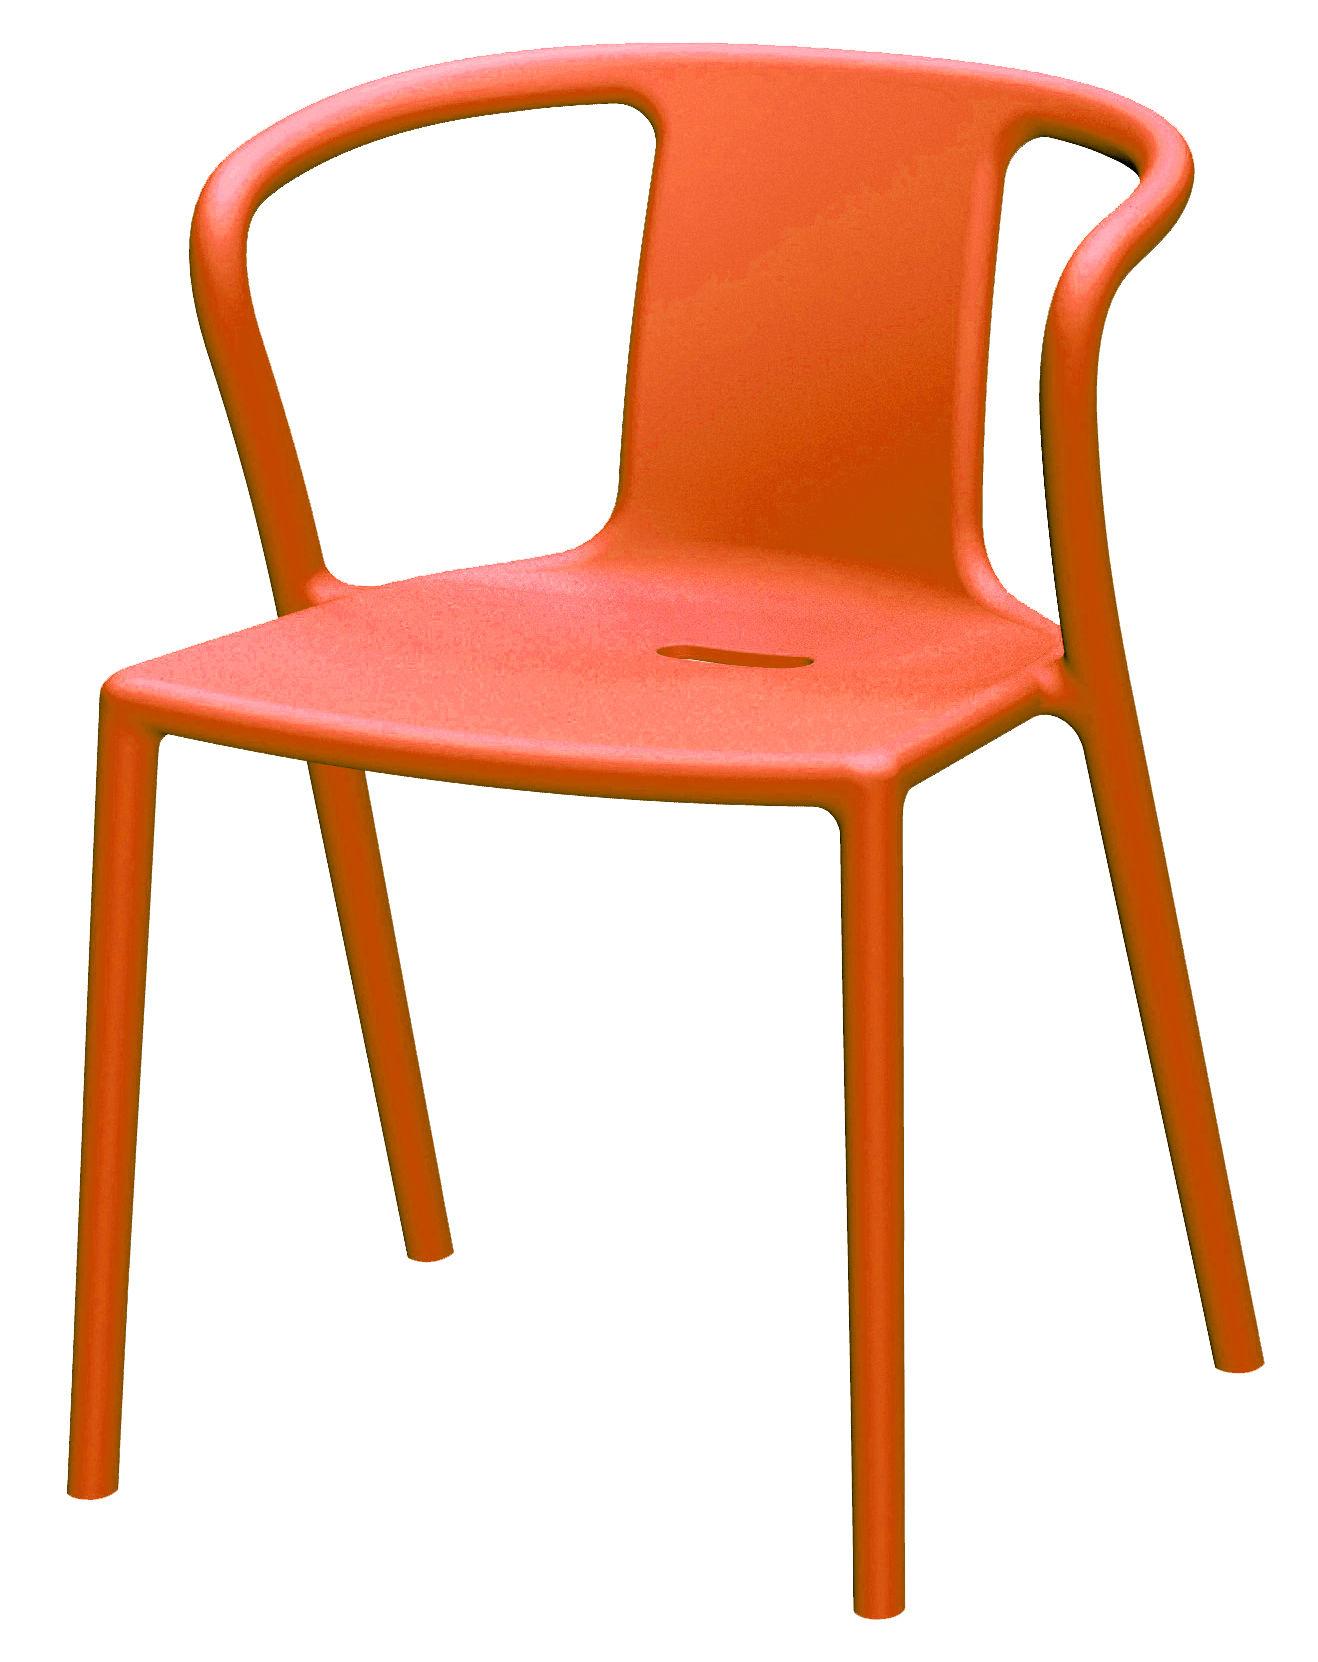 Arredamento - Sedie  - Poltrona impilabile Air-Armchair di Magis - Arancione - Polipropilene